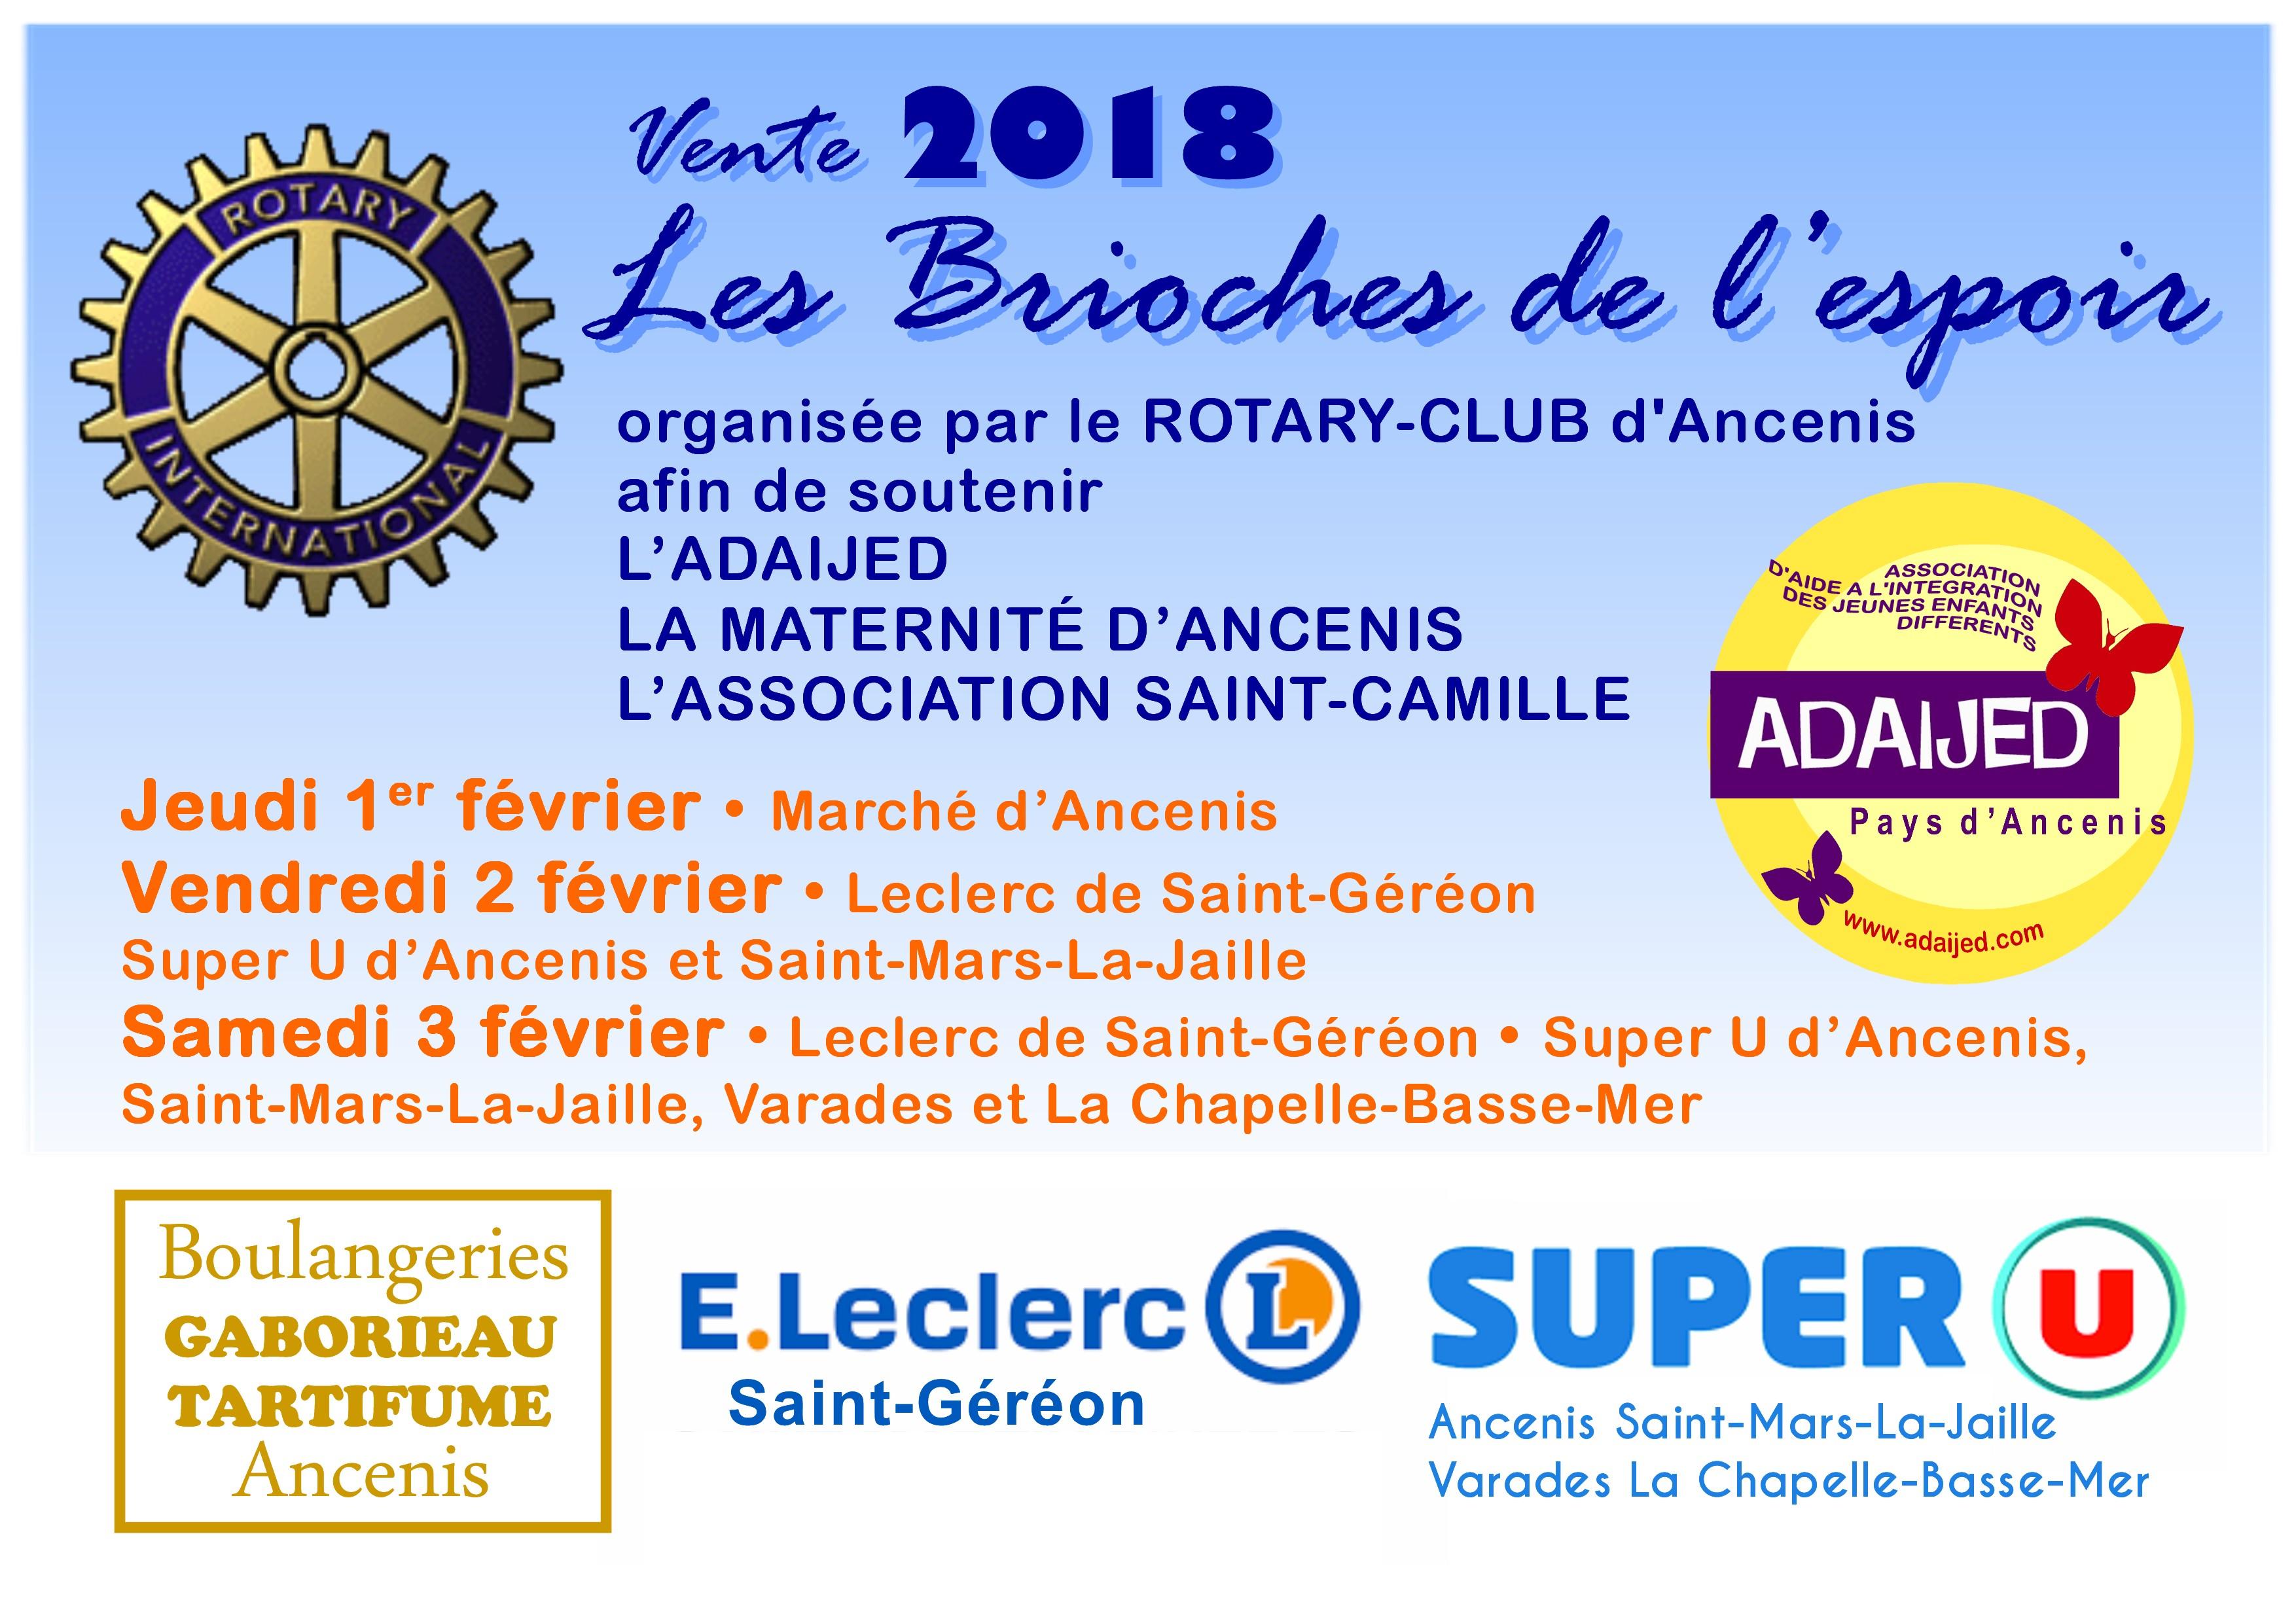 Brioches de l'Espoir Rotary 2018